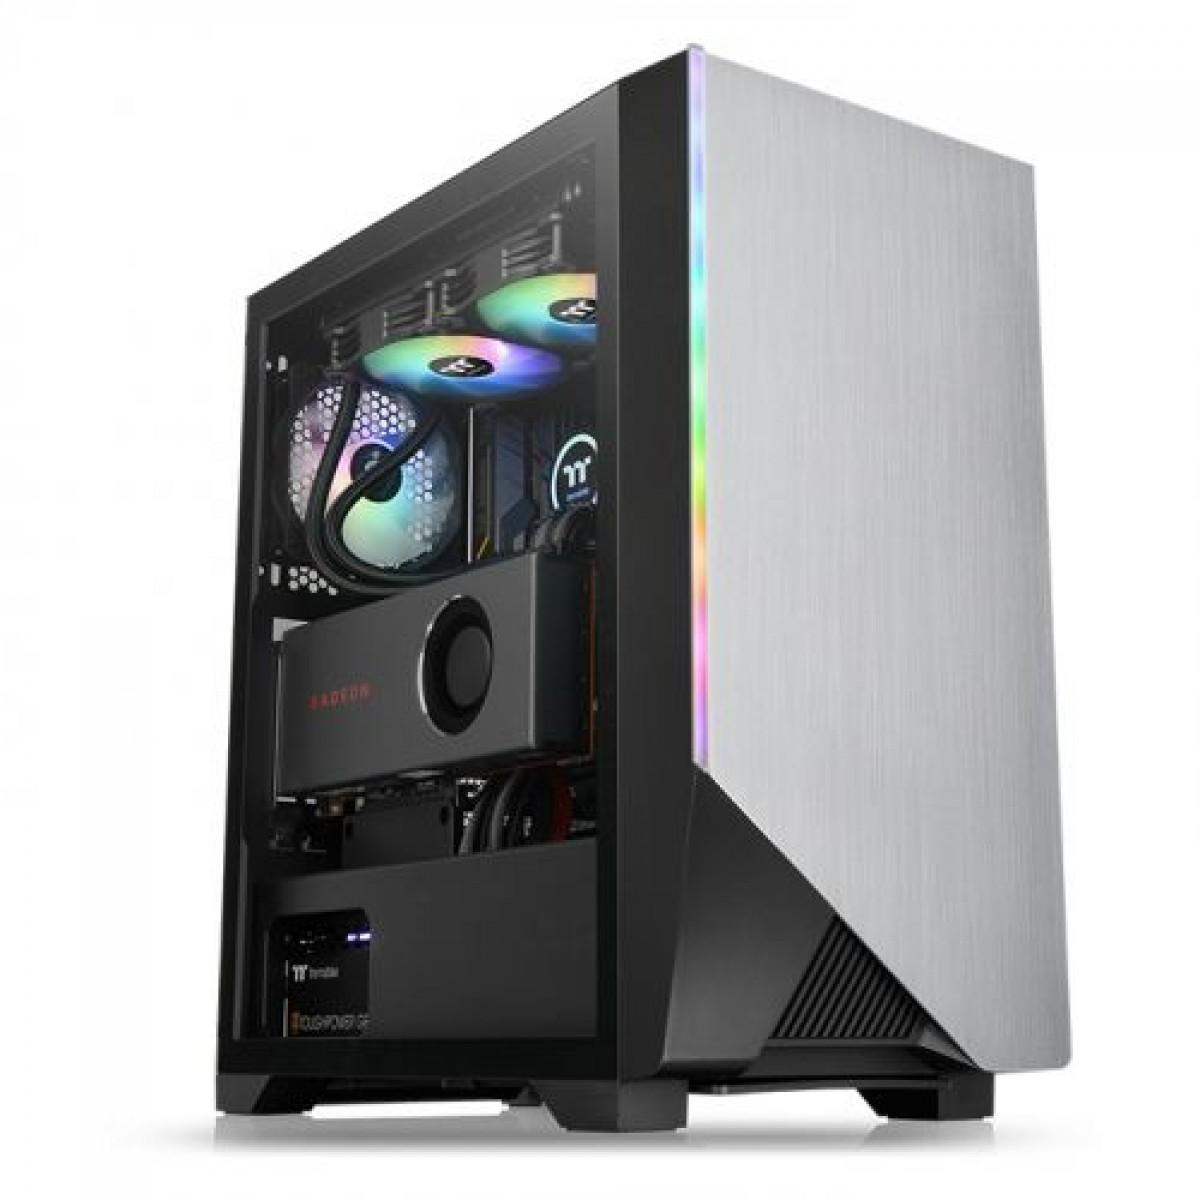 Computador Gamer, RYZEN 5 3400G, Placas de Vídeo RX 570 4GB, 8GB DDR4, HD 1TB